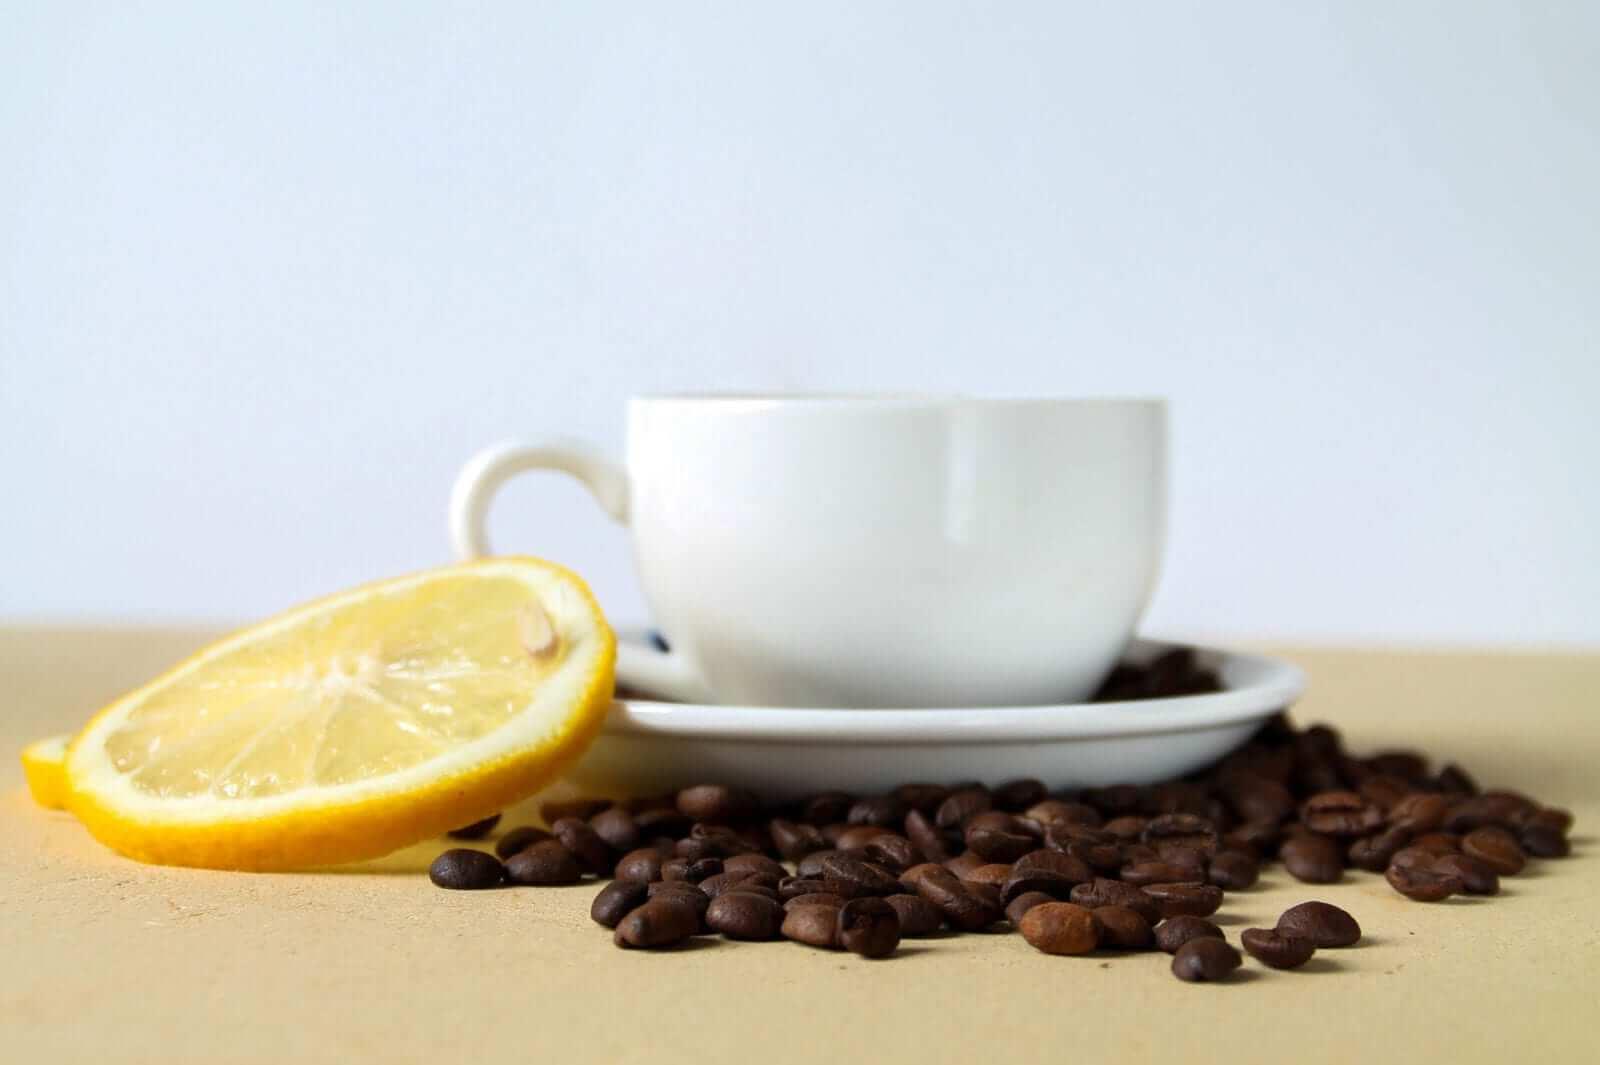 Zitrone mit Kaffee KOPFSCHMERZEN